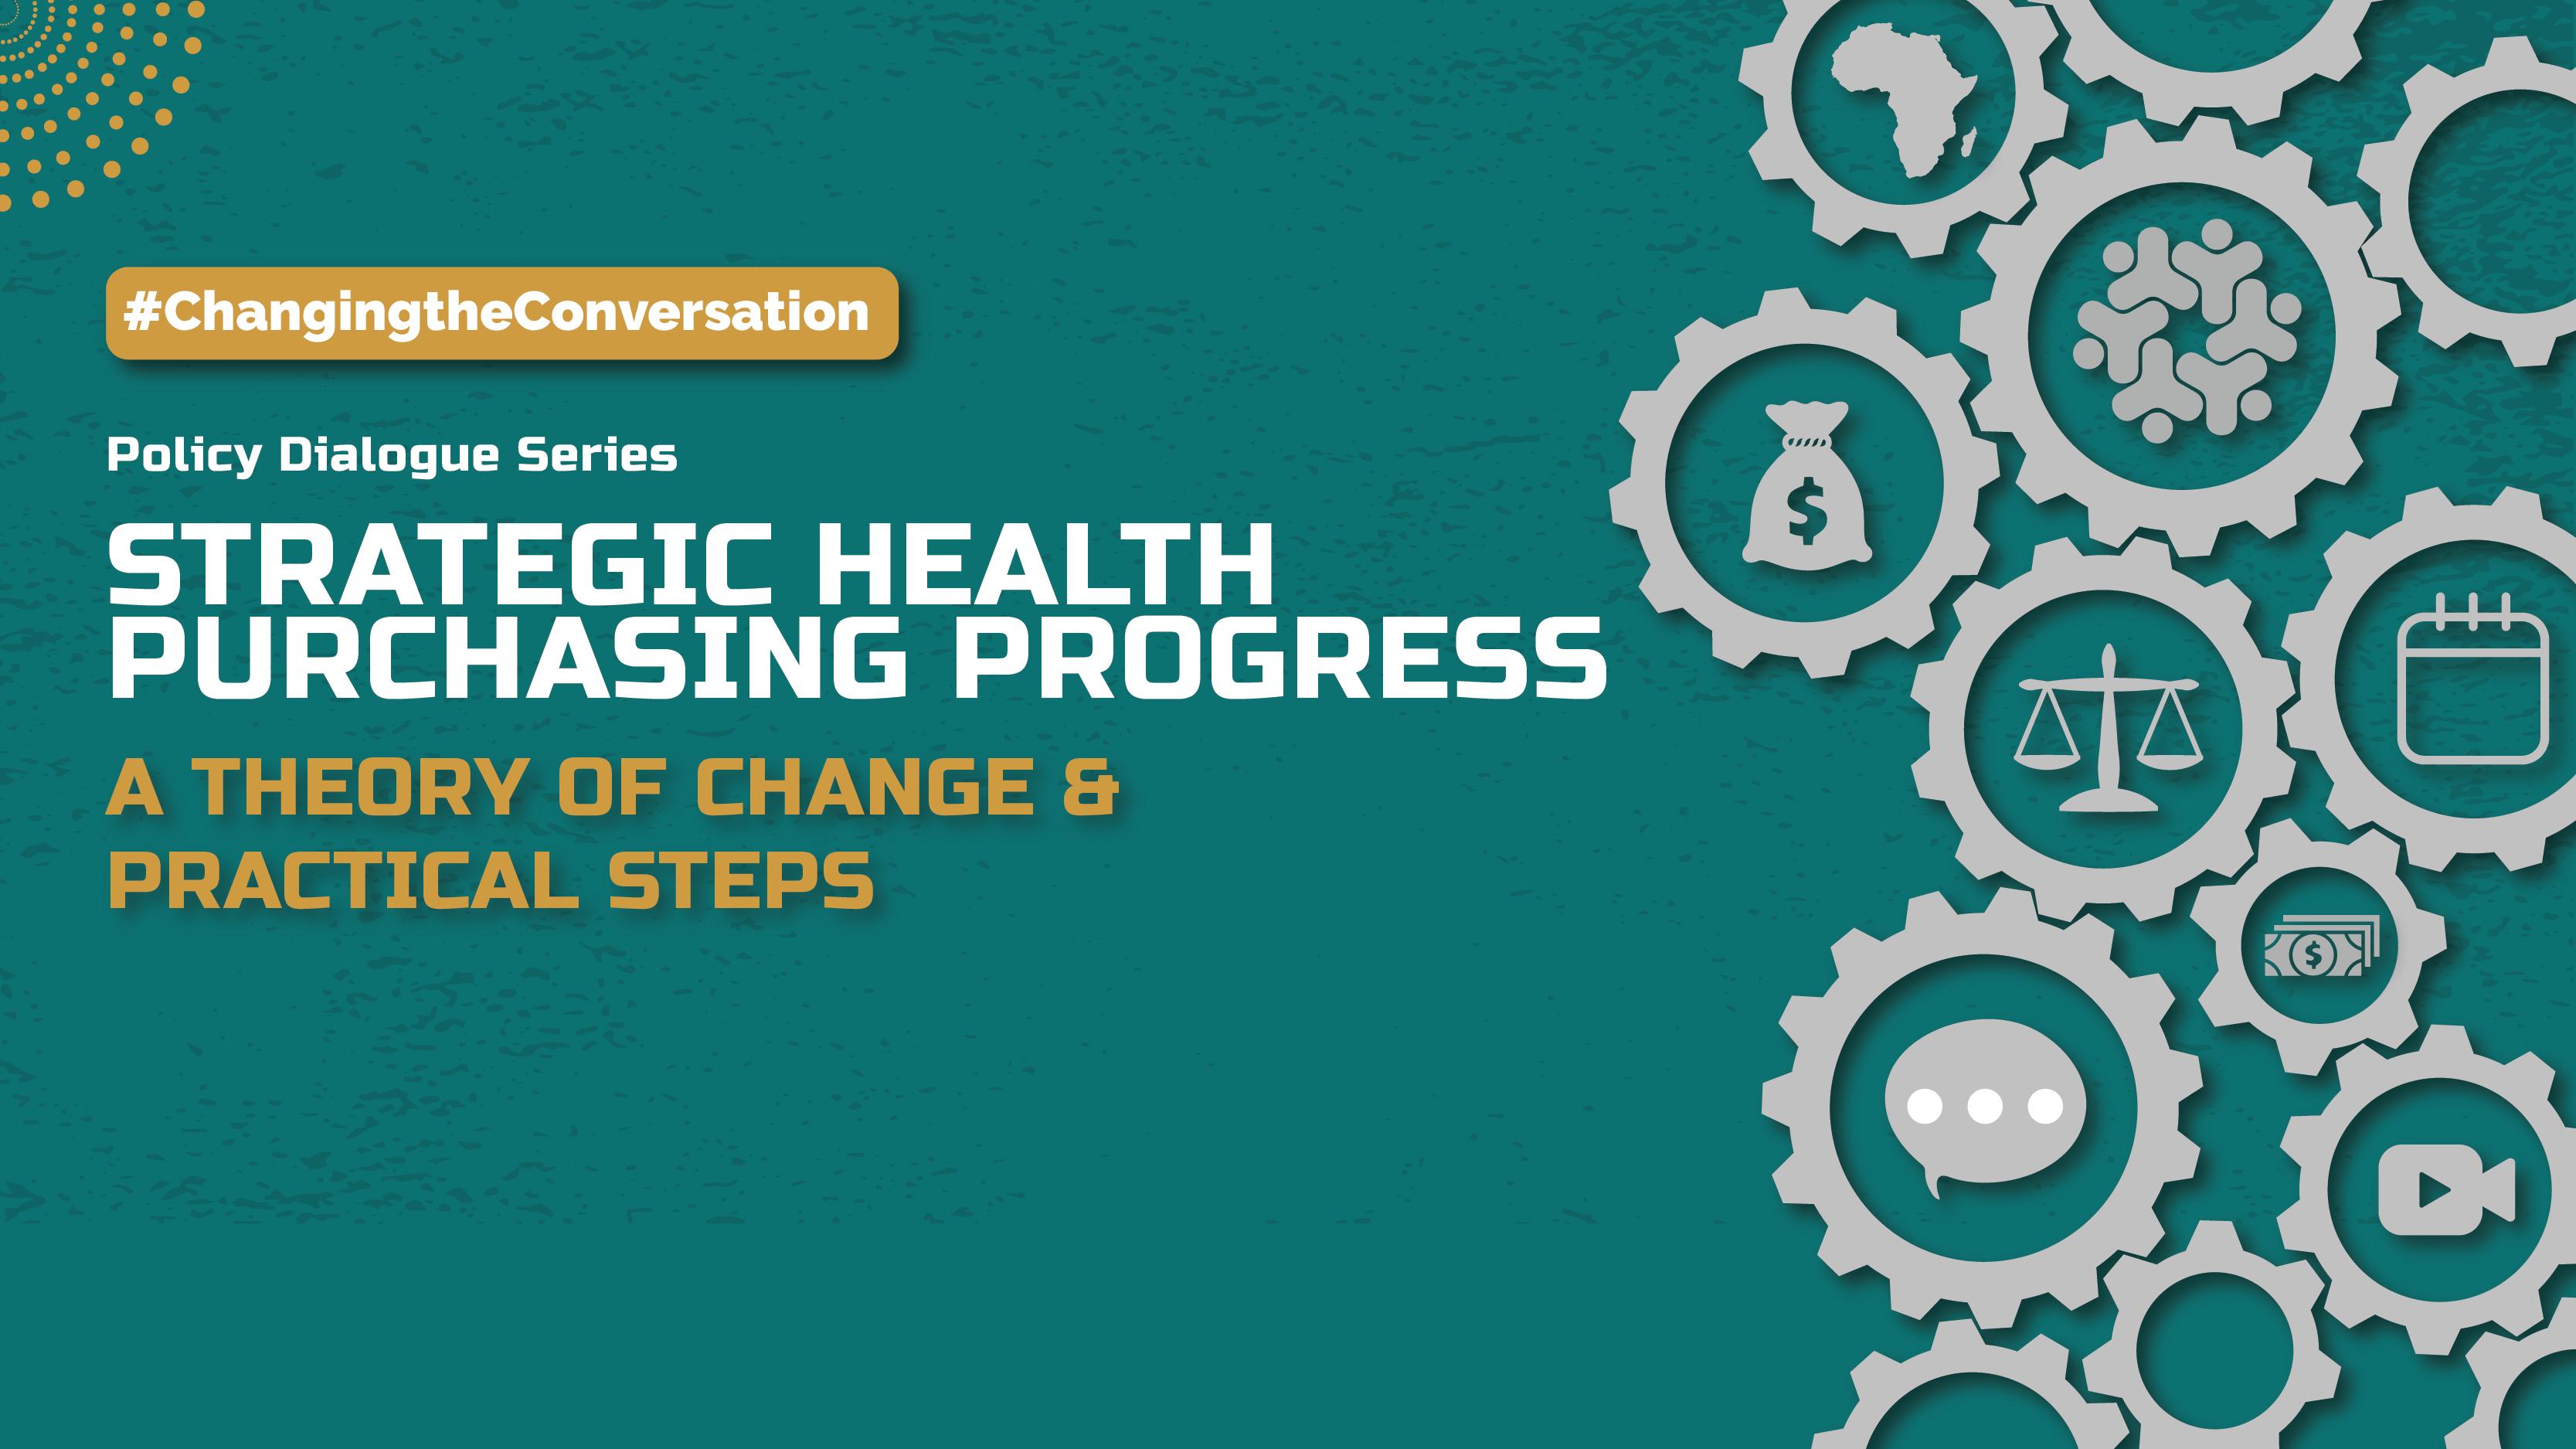 Changing the Conversation: Making progress on strategic health purchasing in sub-Saharan Africa